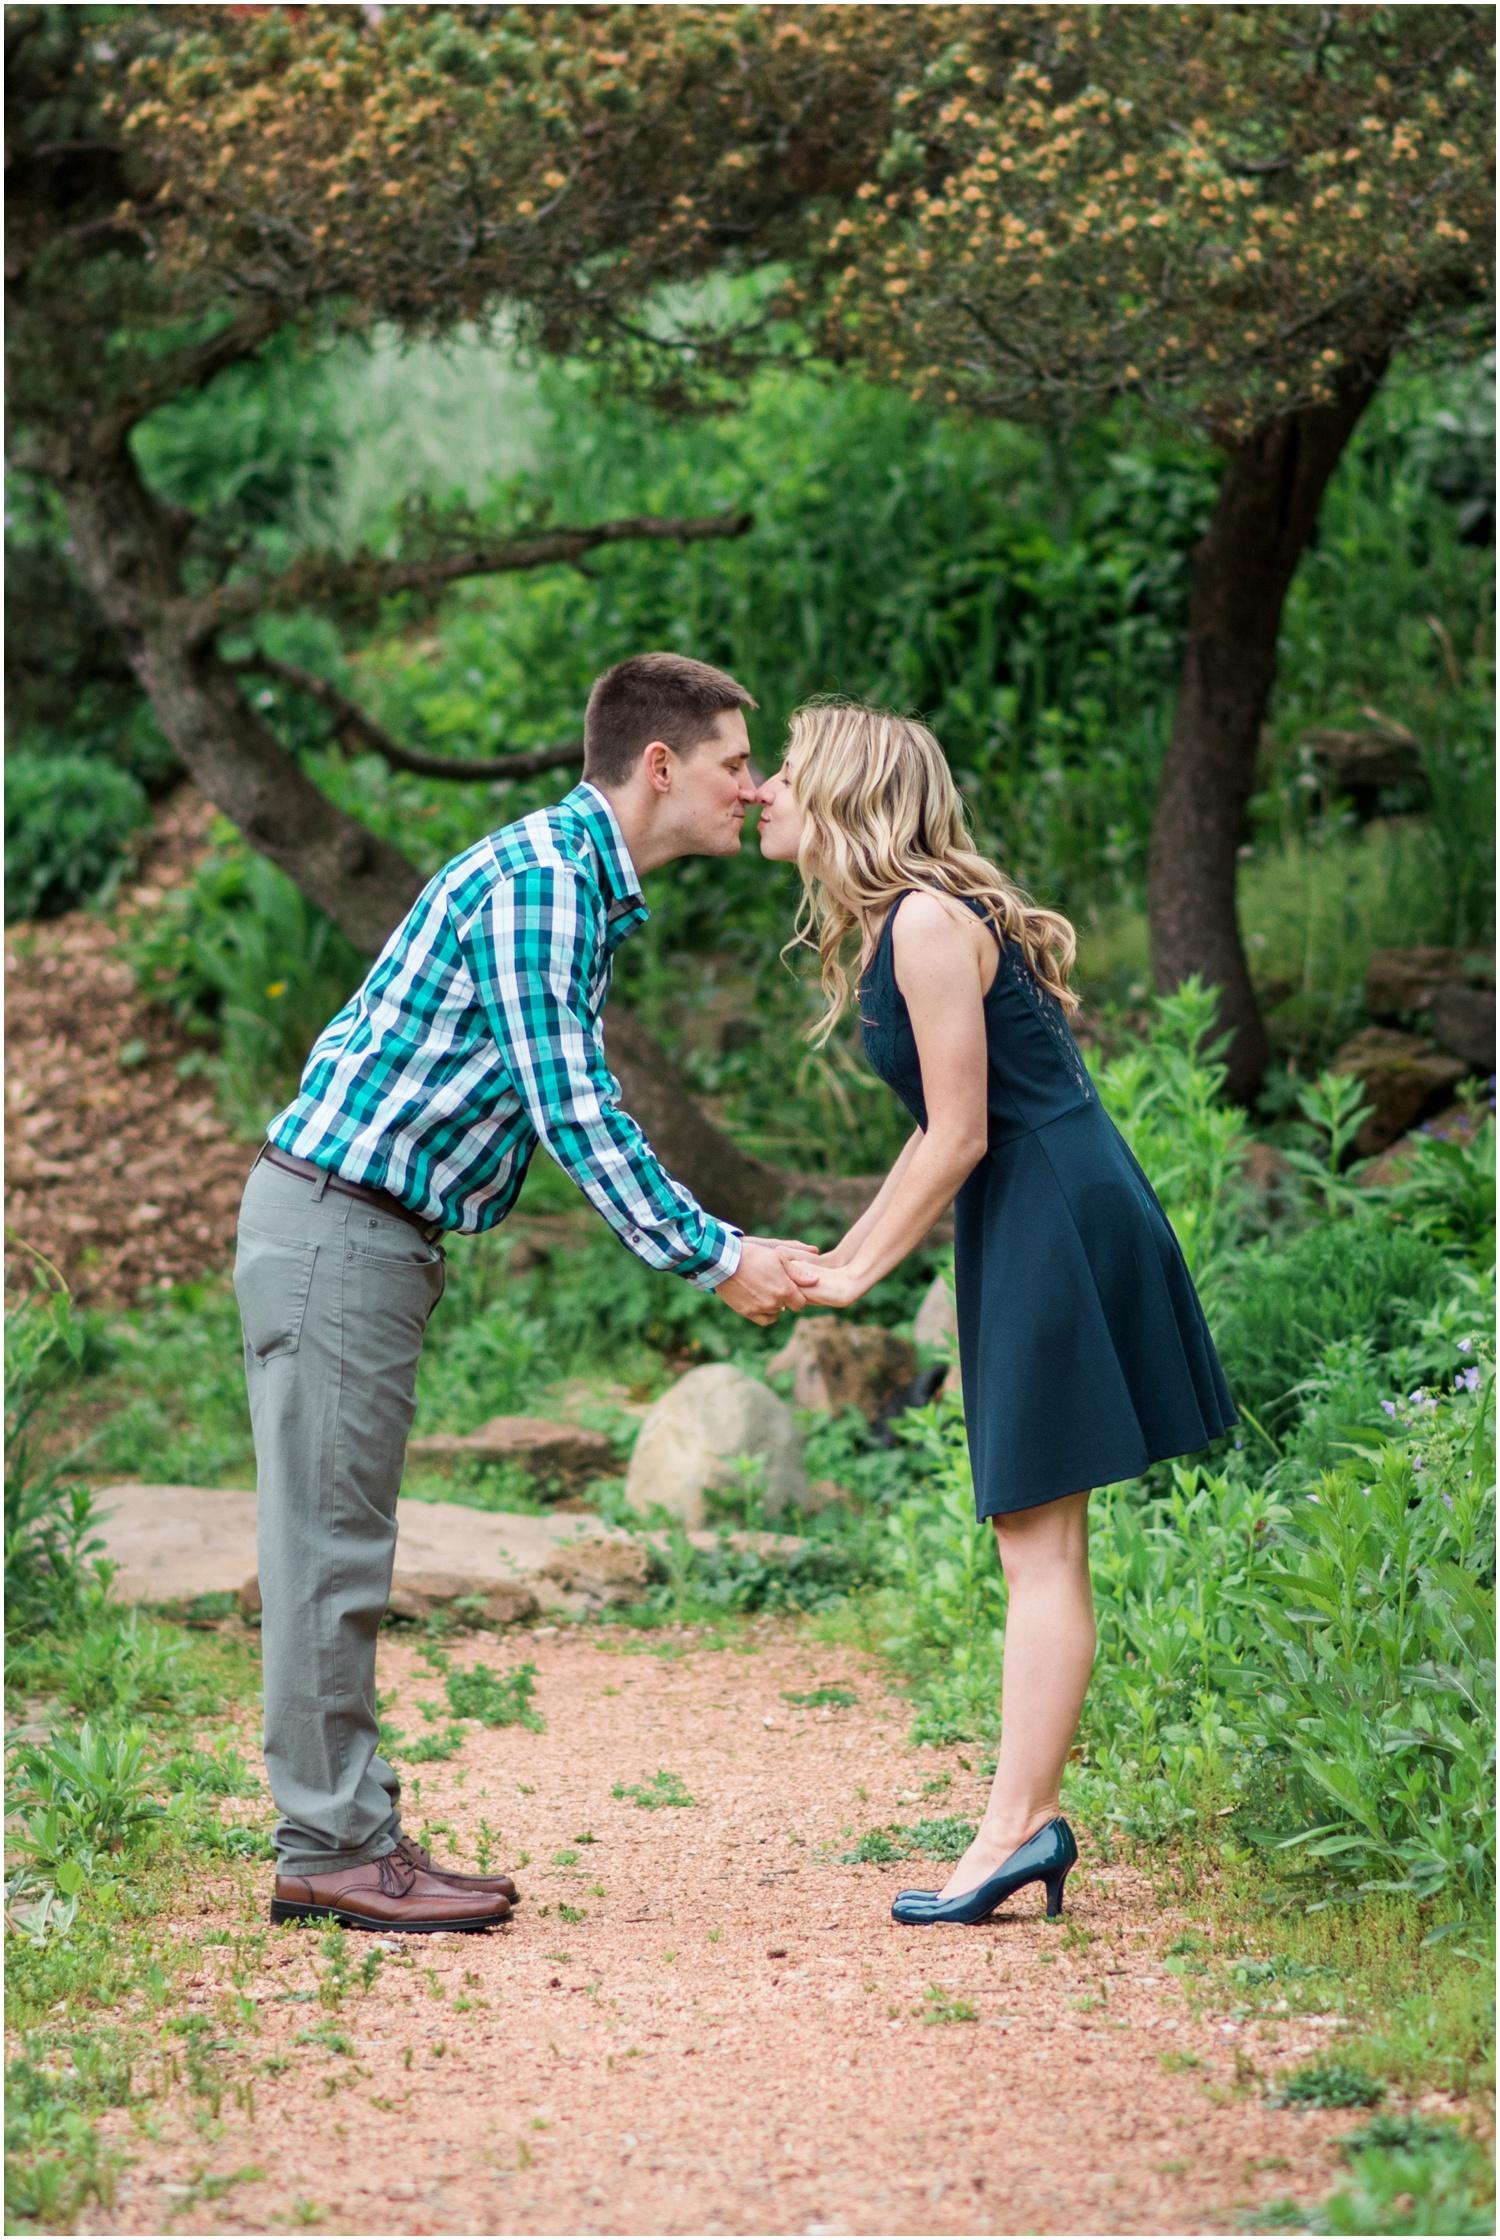 Paquette_Park_Portage_WI_Engagement_Photos_Heather_and_Derek_0027.jpg